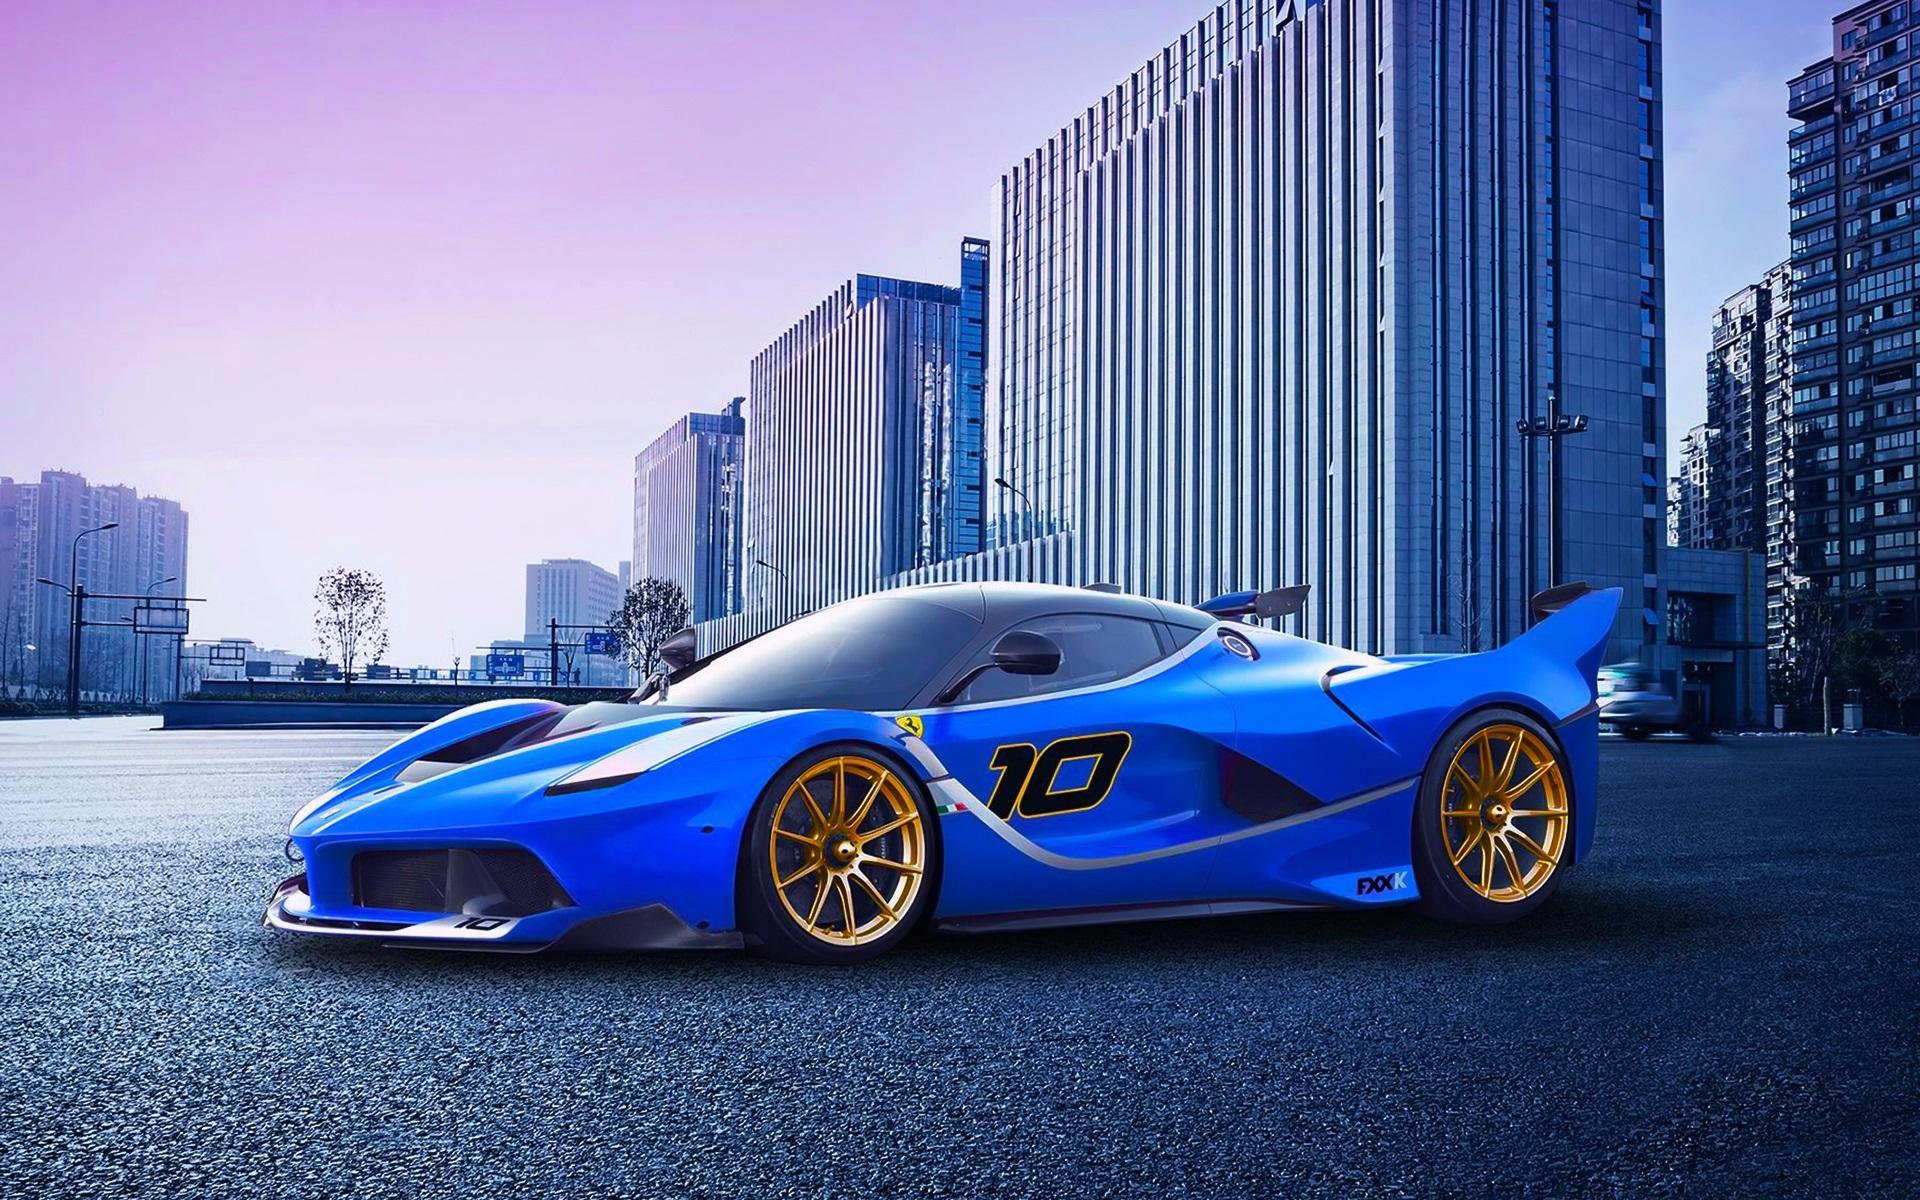 Wallpaper Ferrari Fxx K Race Car Blue Supercar 1920x1200 Hd Picture